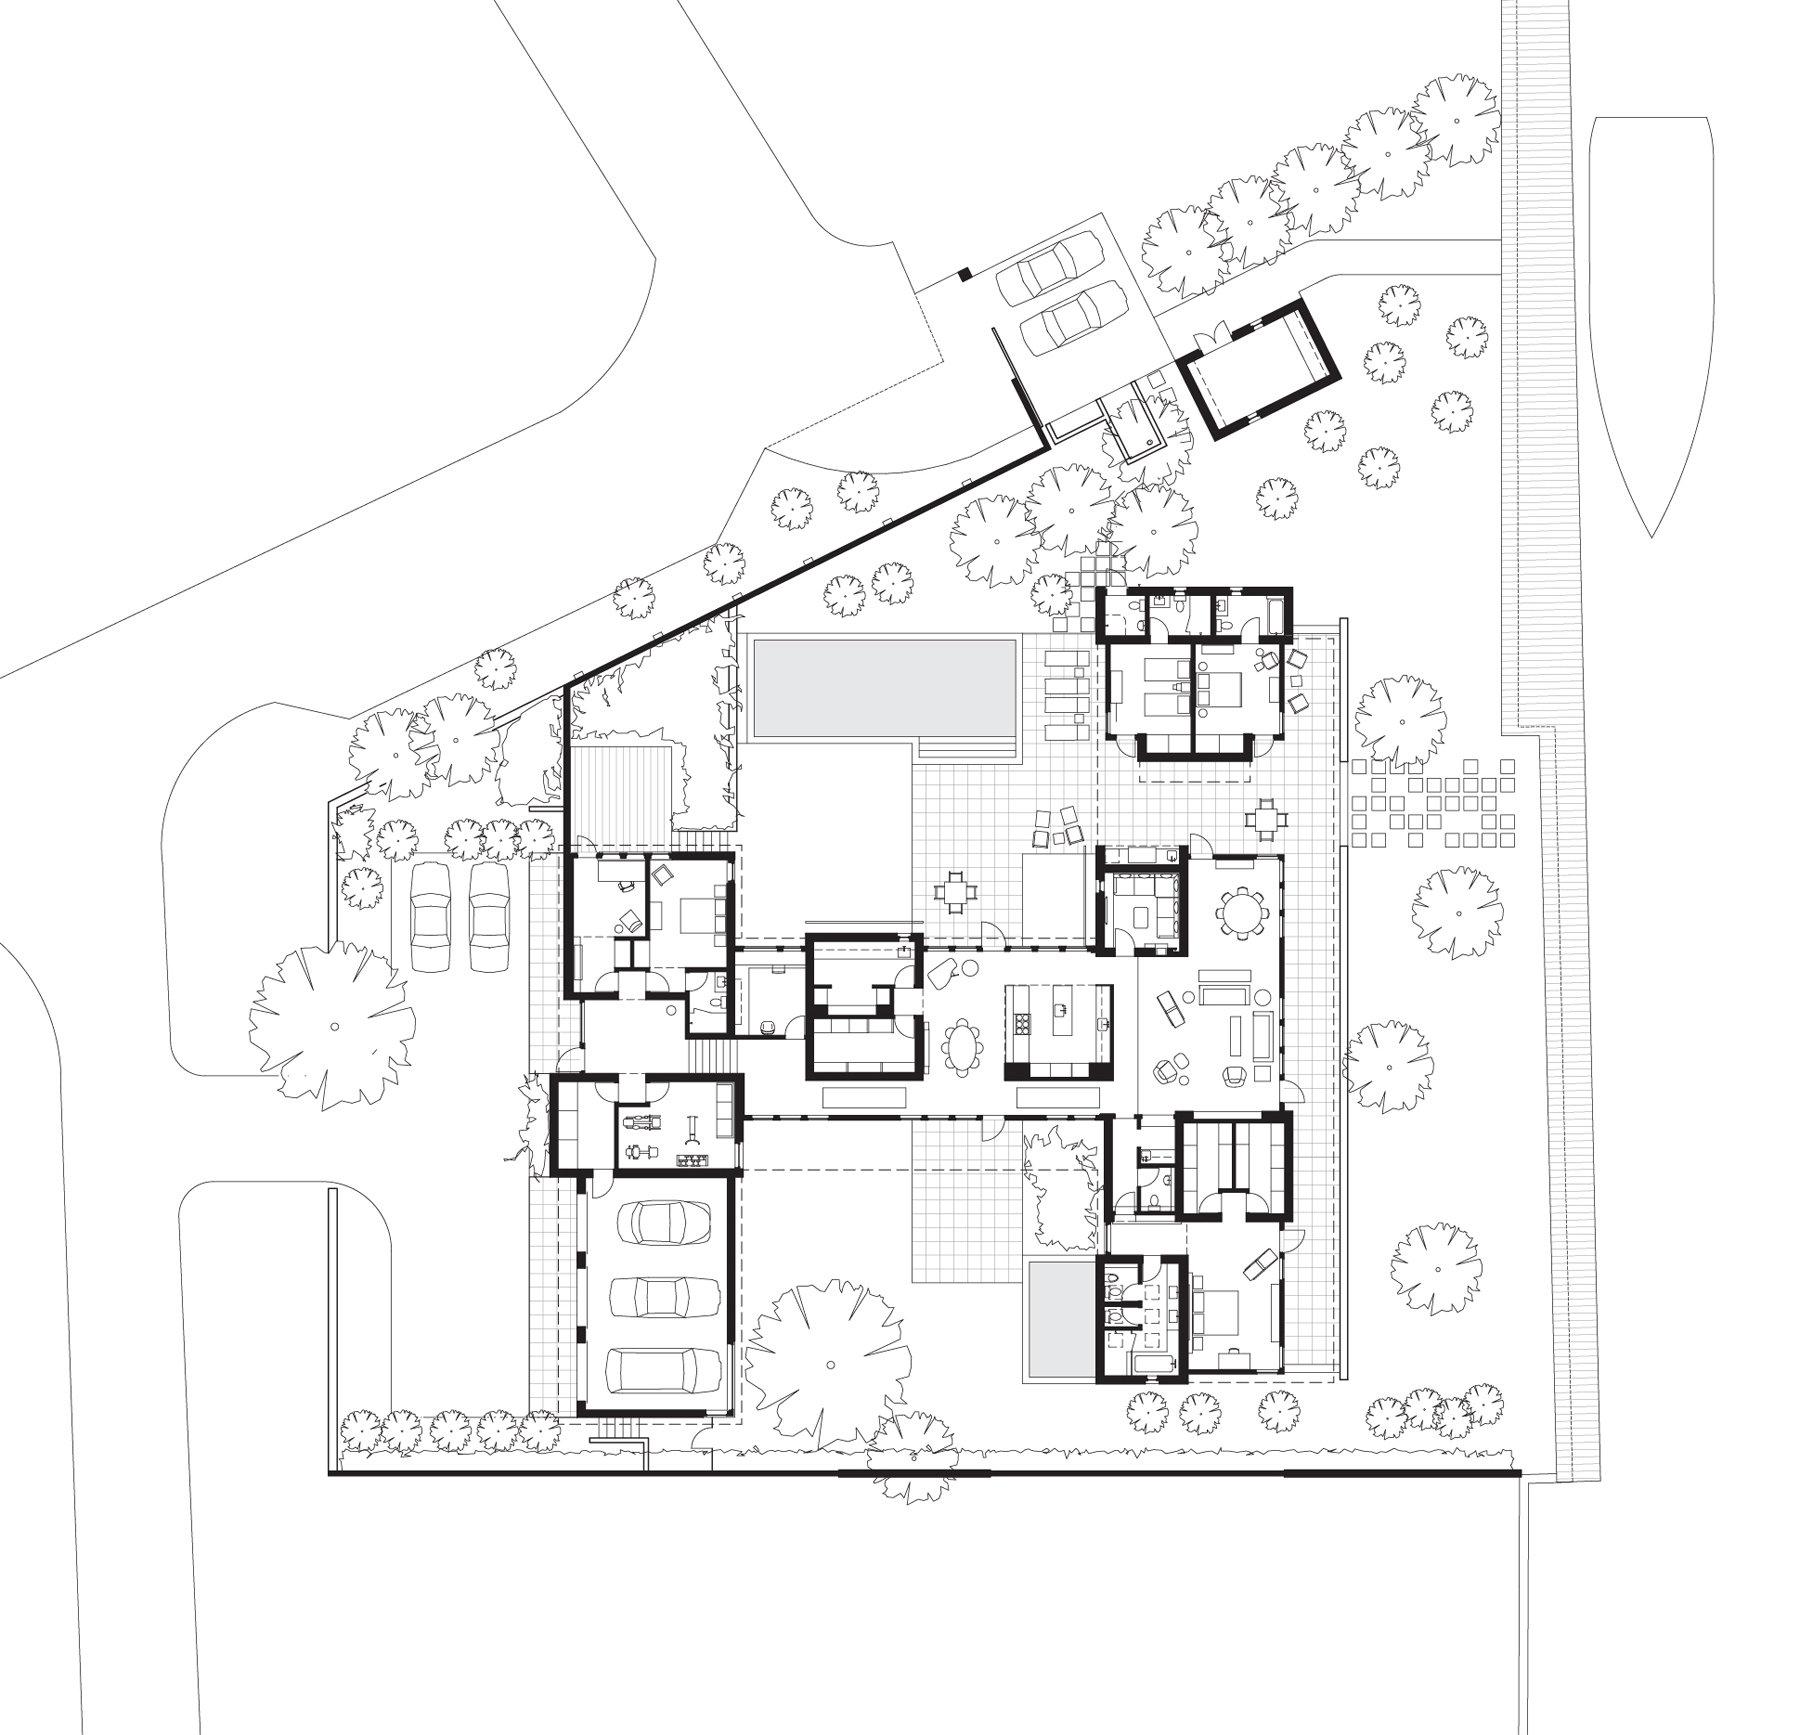 1800x1735 Sospiro Canal House Work Deborah Berke Partners Architecture